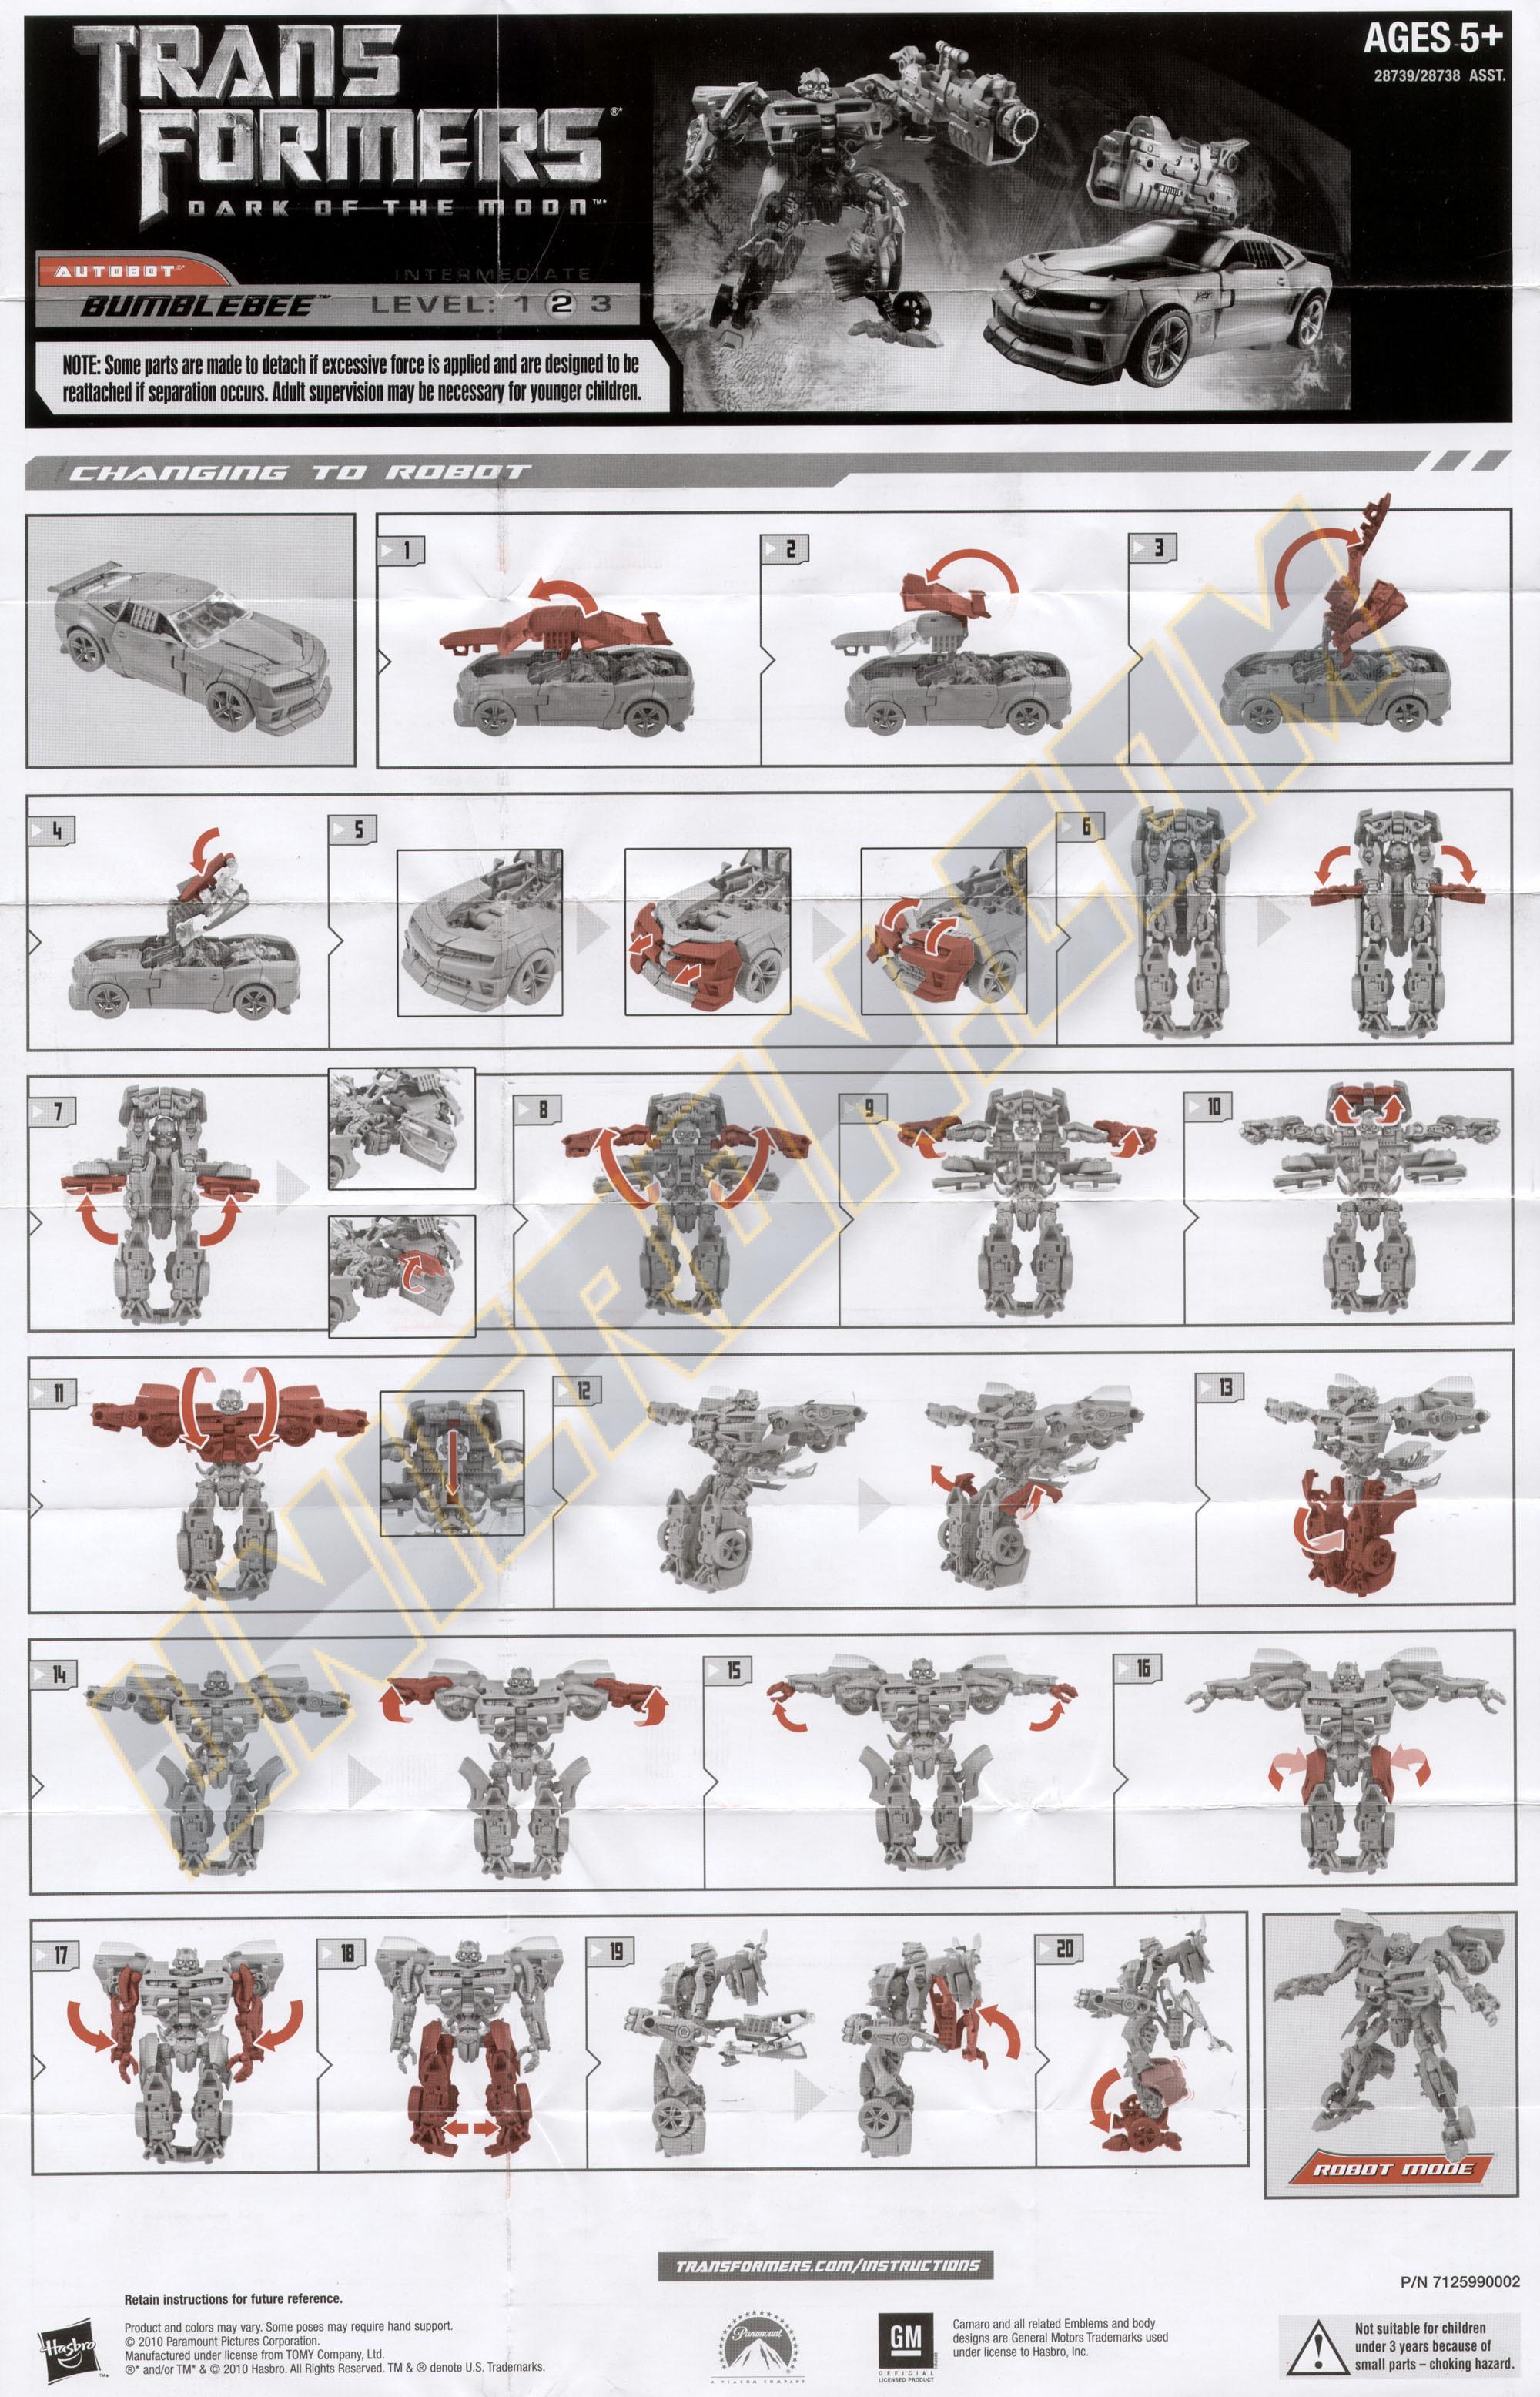 Deluxe class bumblebee (transformers, movie dark of the moon.